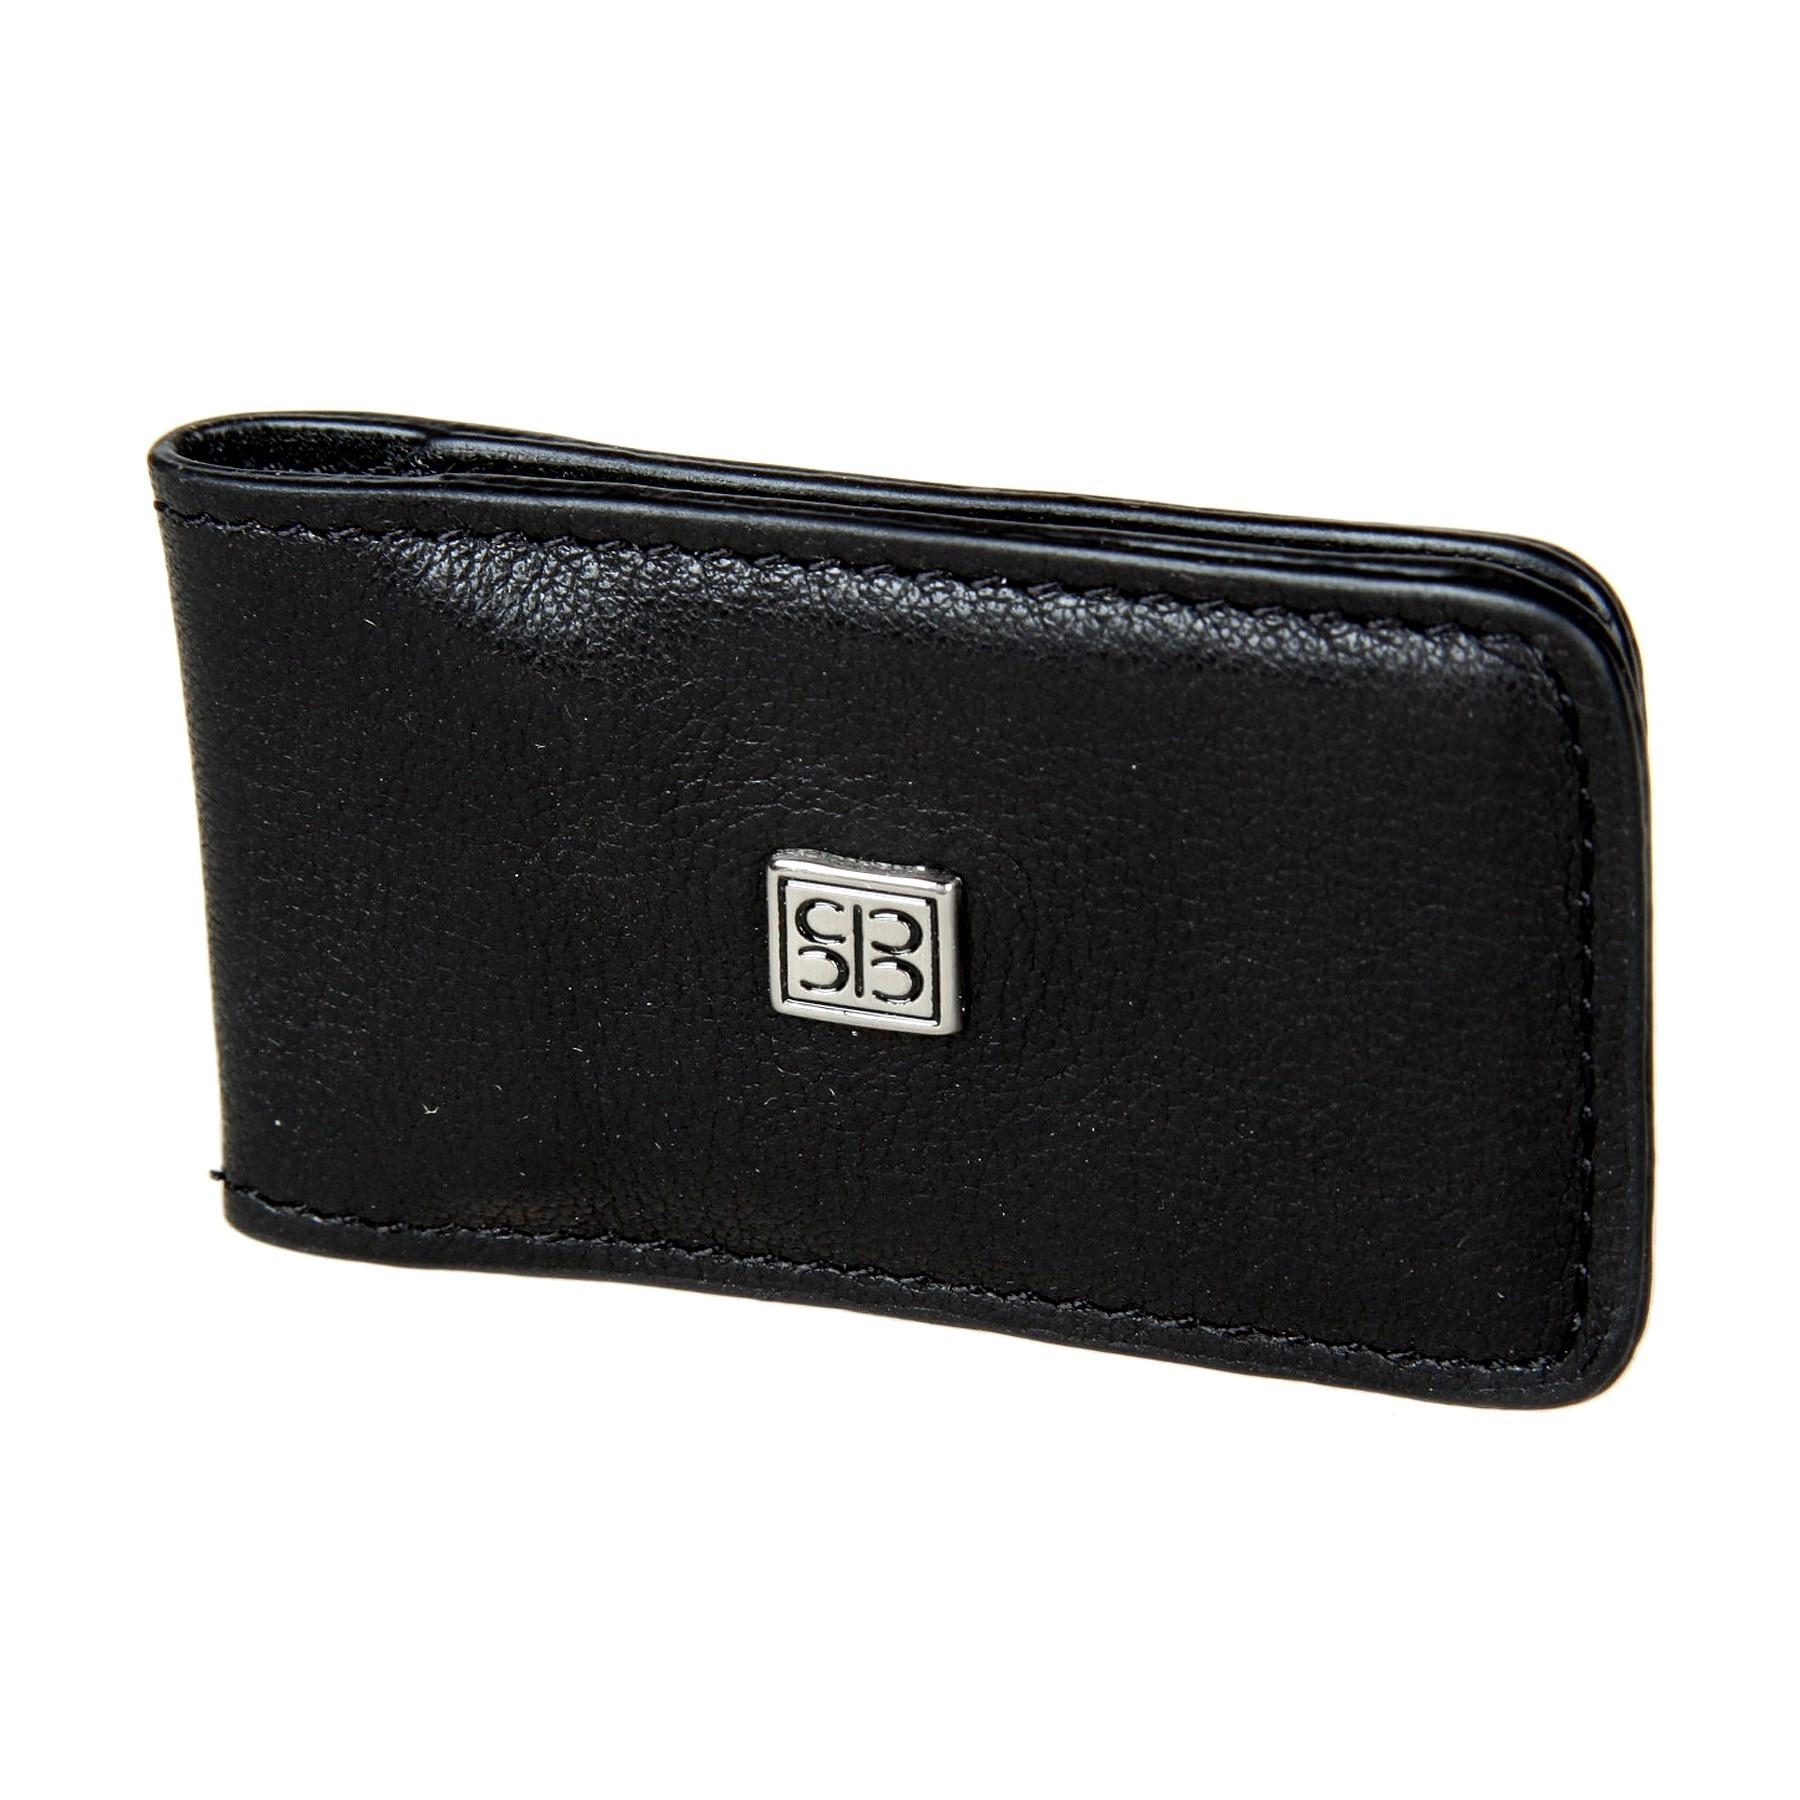 Money clip Sergio Belotti 1201 West black edcgear abs double sides slim money clip card holder